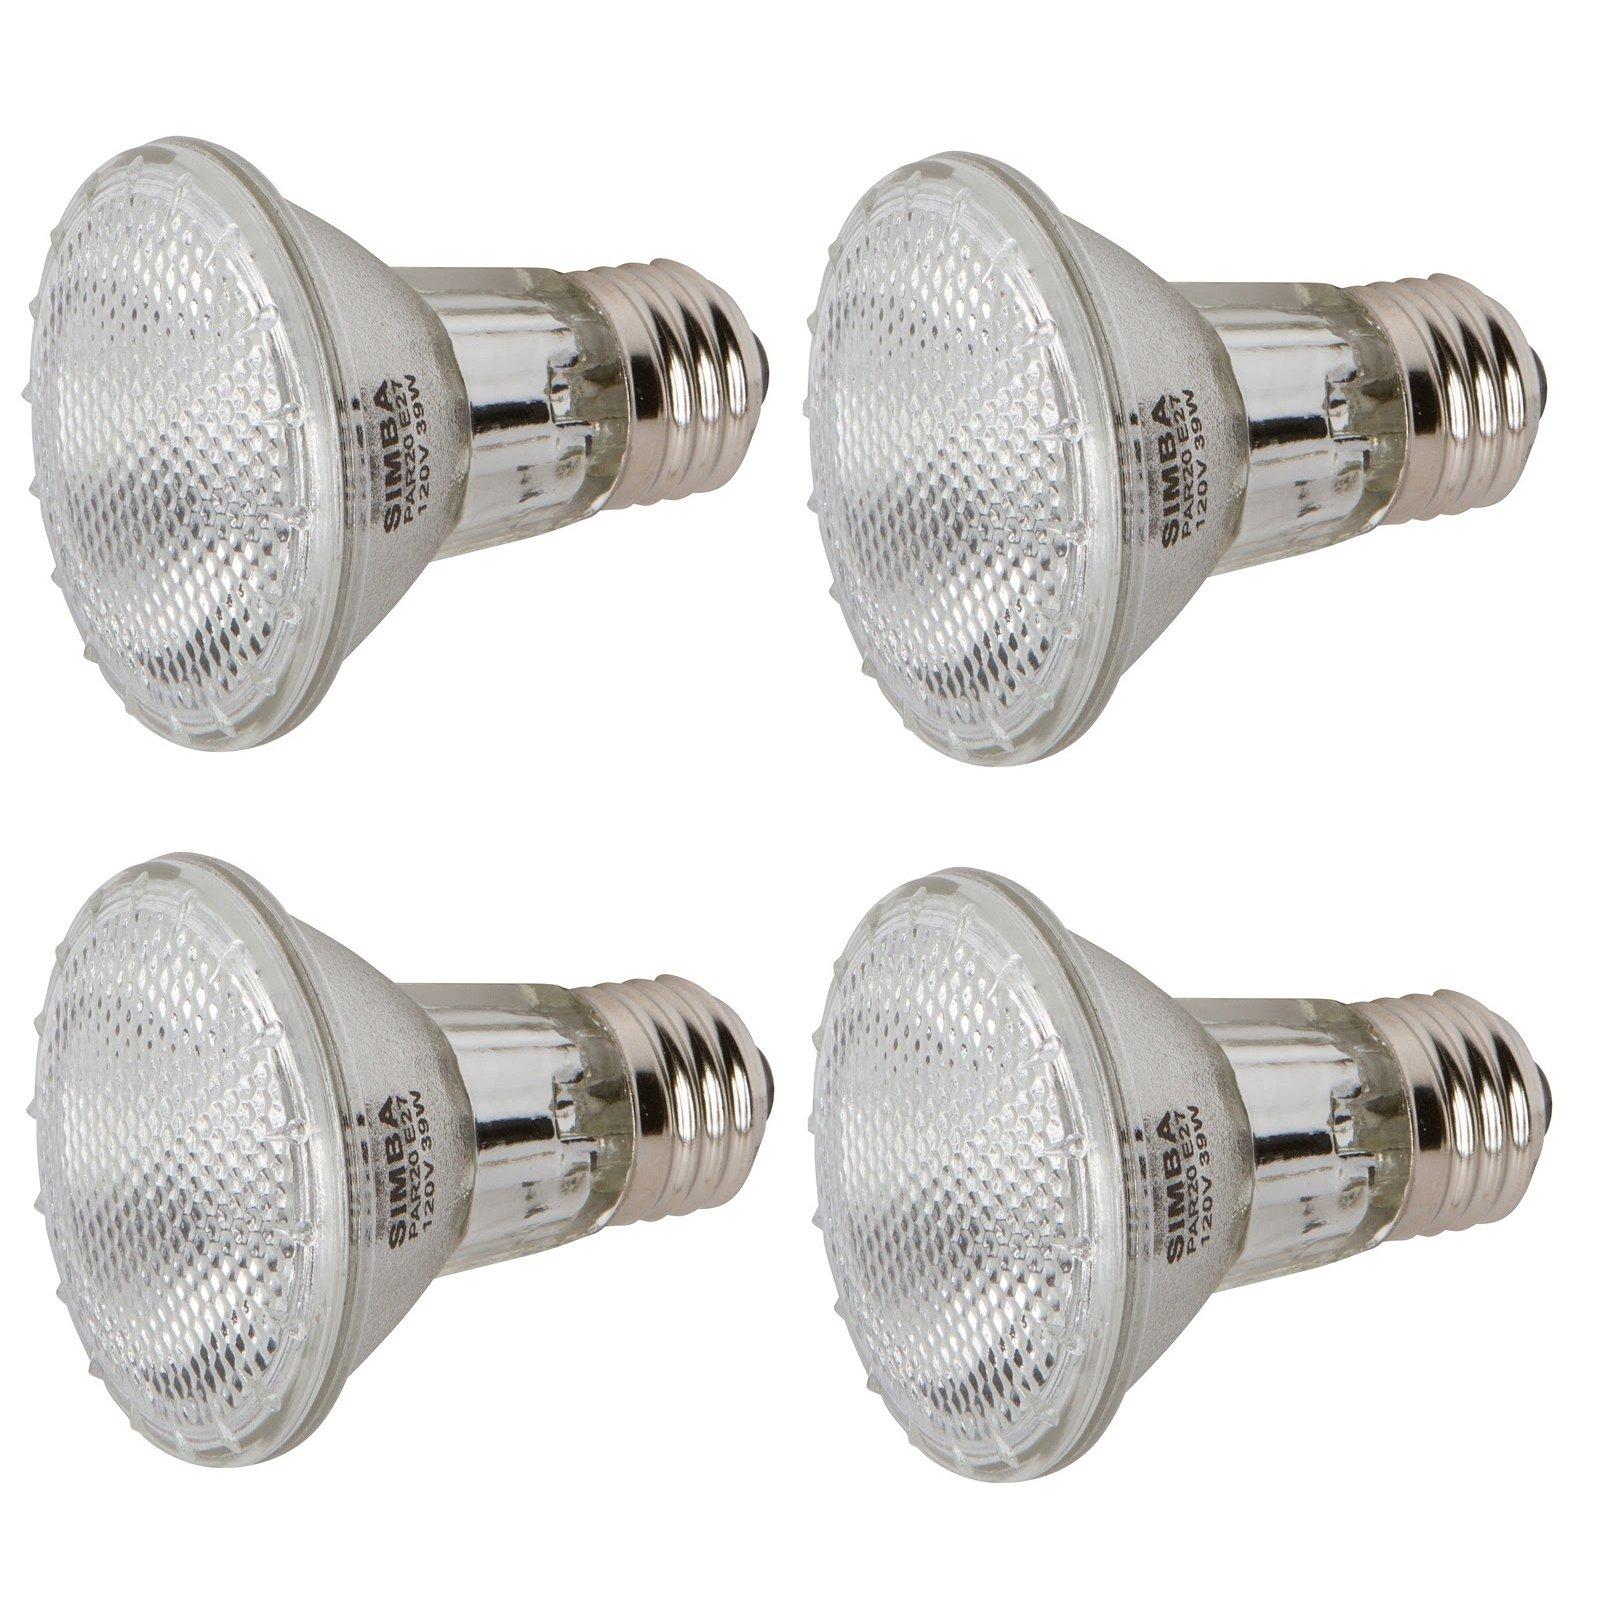 [4 Pack] Simba Lighting™ Halogen 39PAR20/FL 120V 39 Watt PAR20 High Output (50W Equivalent) Narrow Flood PAR 20 Light Bulbs Soft White E26 Medium Base